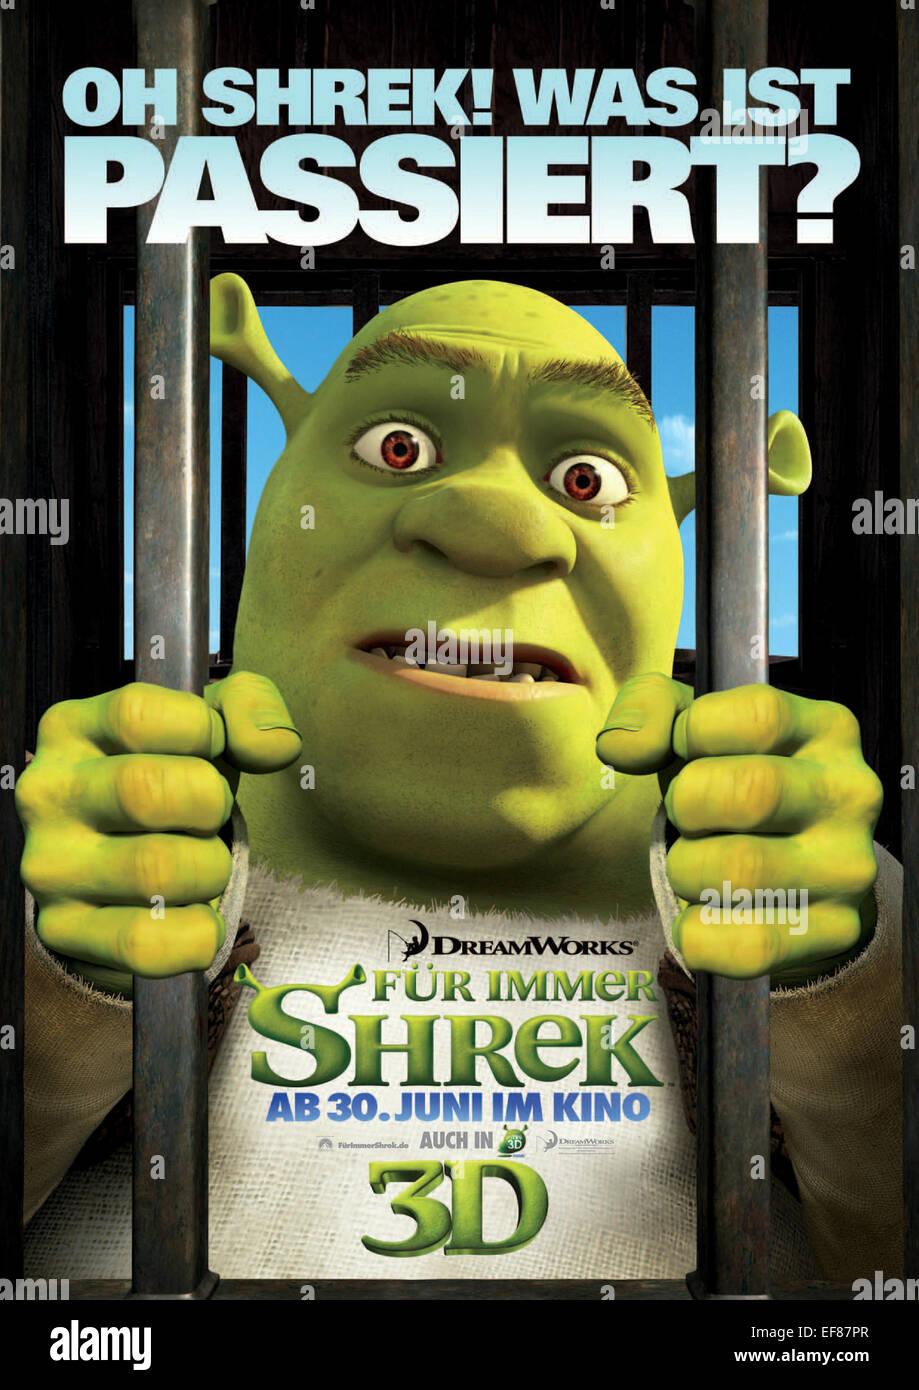 shrek poster stock photos  u0026 shrek poster stock images